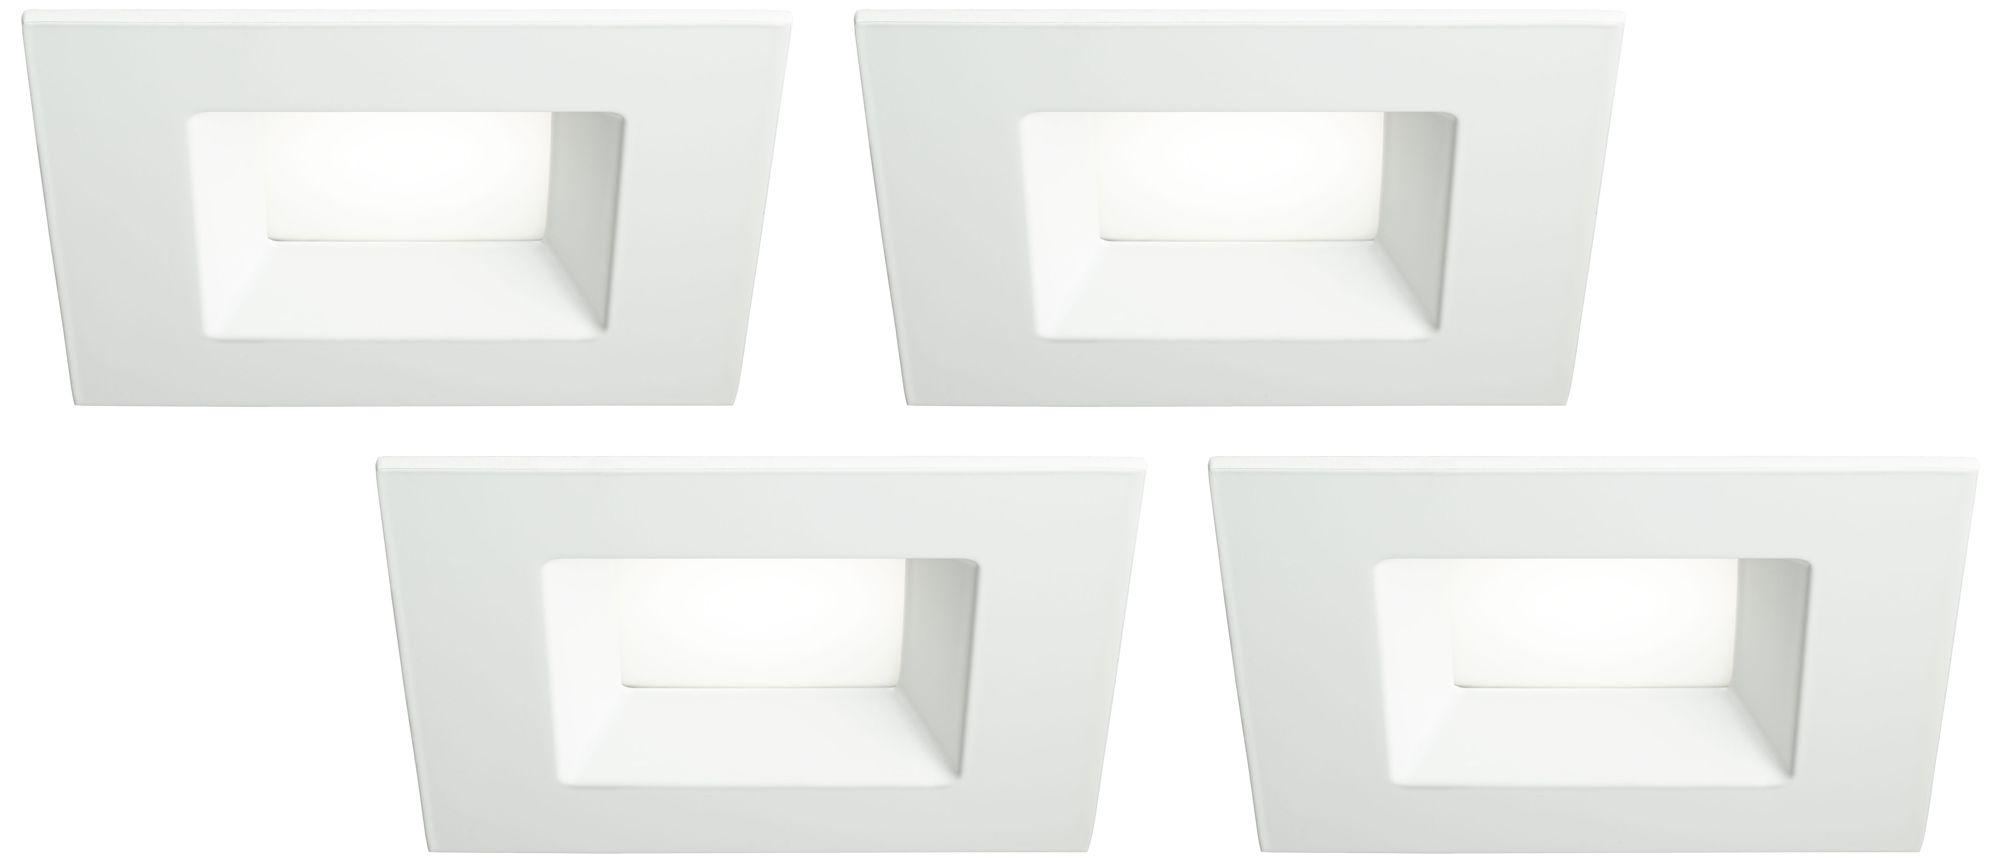 6 white square retrofit 15 watt led recessed lights 4 pack